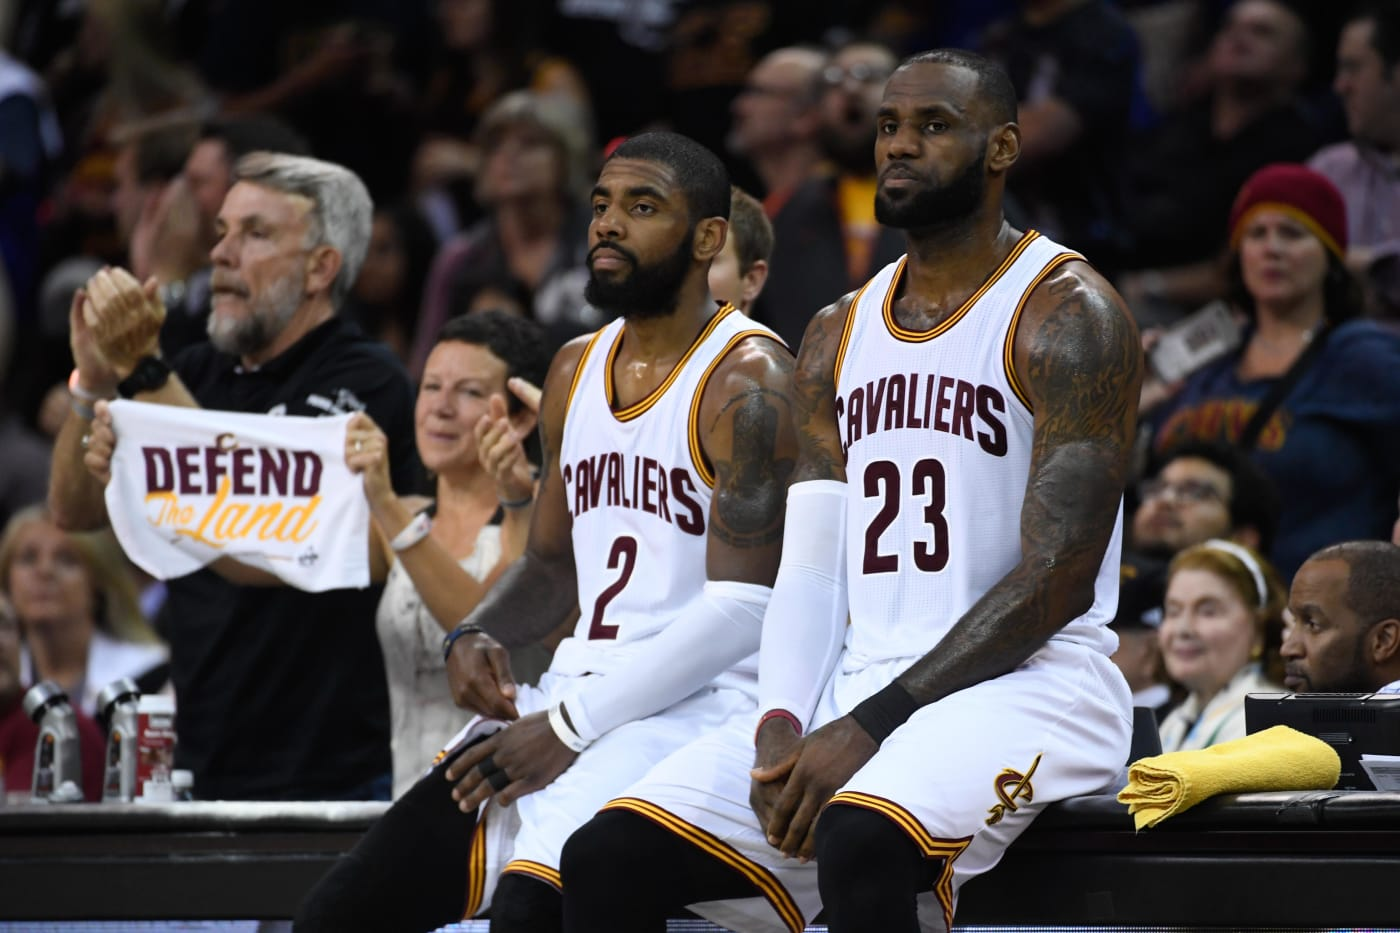 Kyrie Irving LeBron James Game 4 NBA Finals 2017